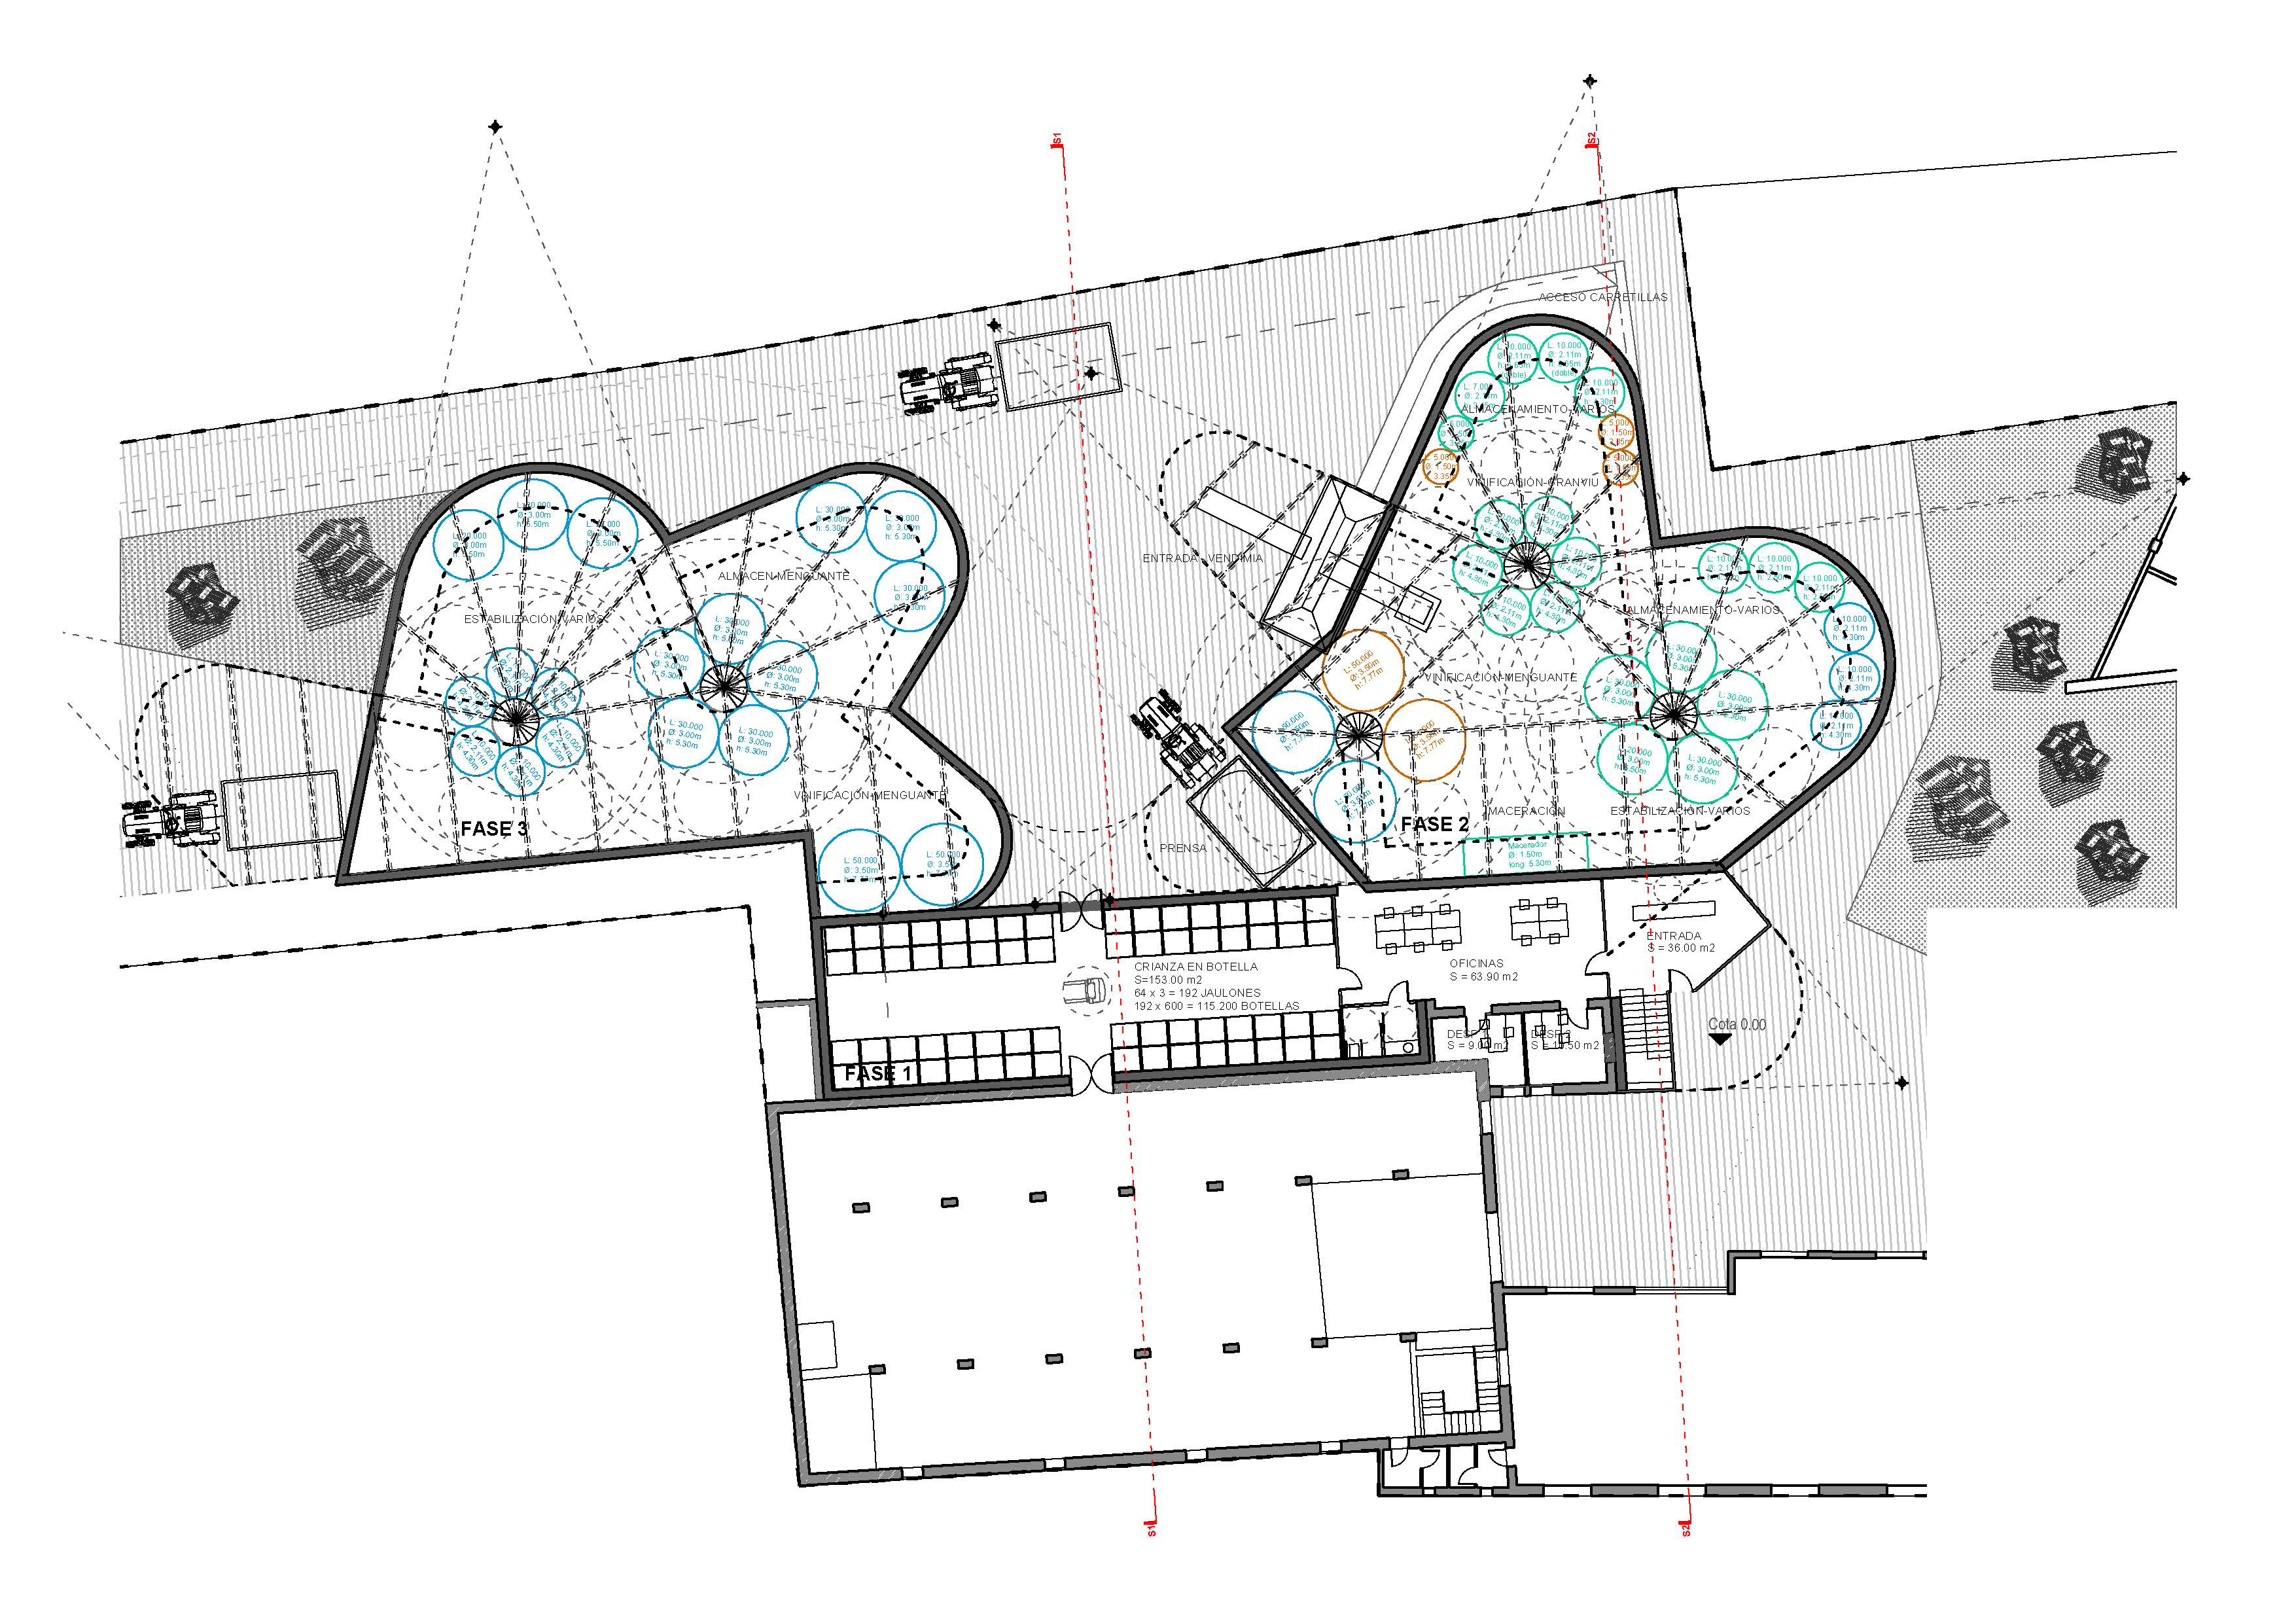 P1503_VBP_Drawing3